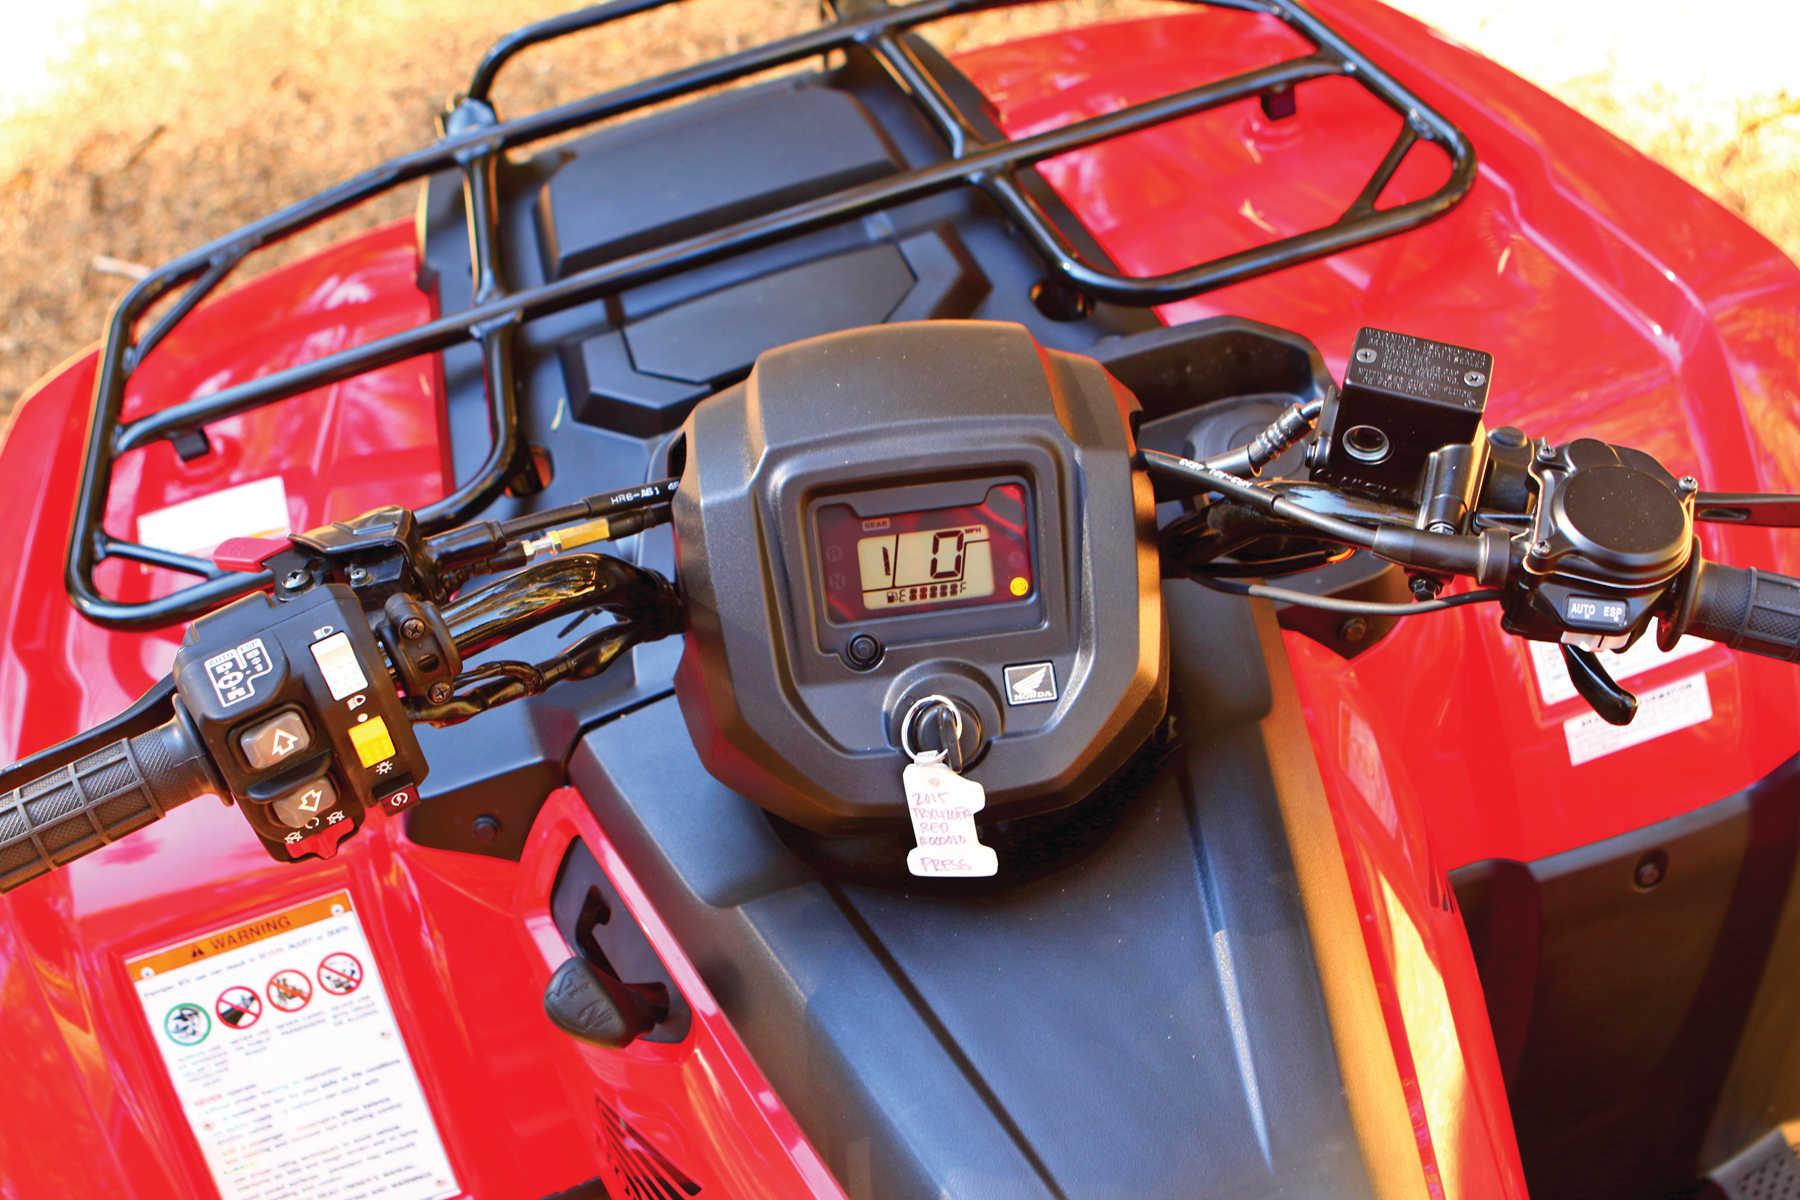 2003 Honda Rancher Wiring Diagram Honda Ride Amp Review Sierra Club Atv Illustrated